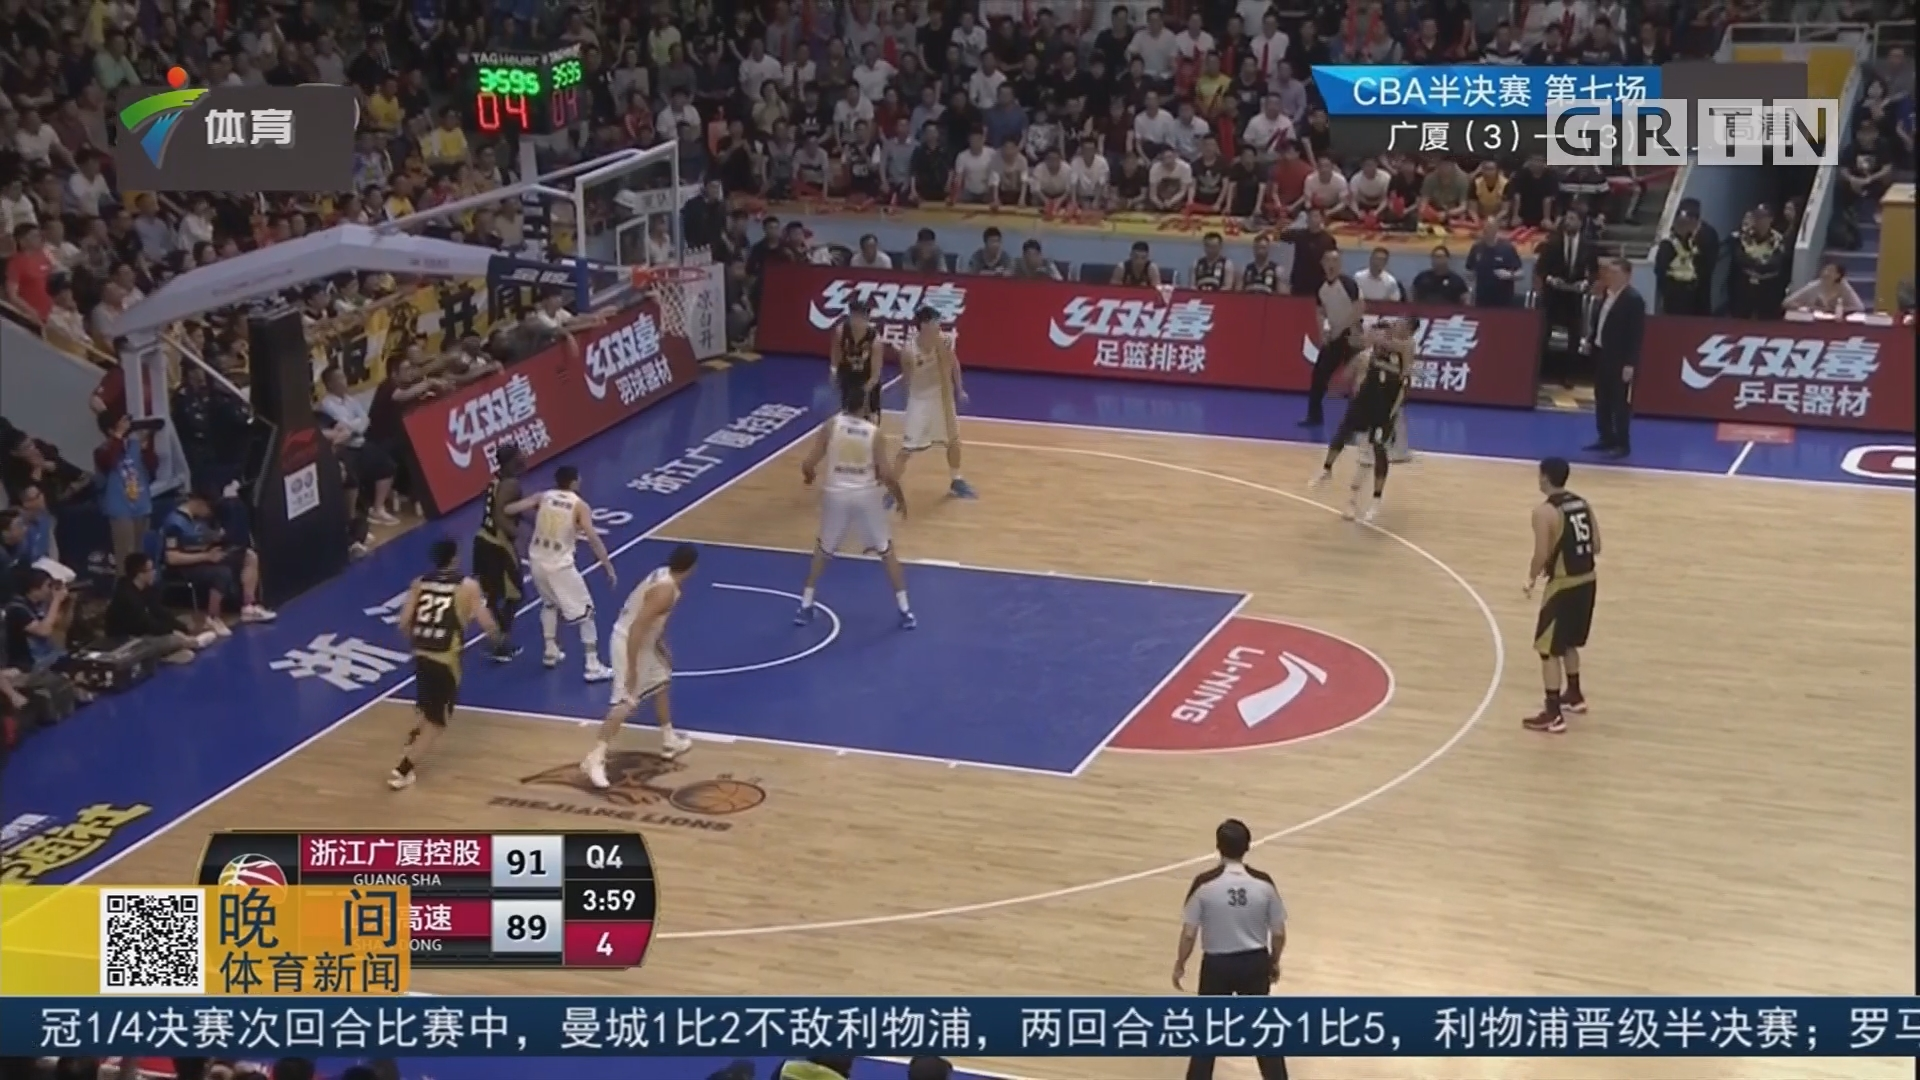 CBA半决赛抢七大战 广厦胜山东晋级总决赛